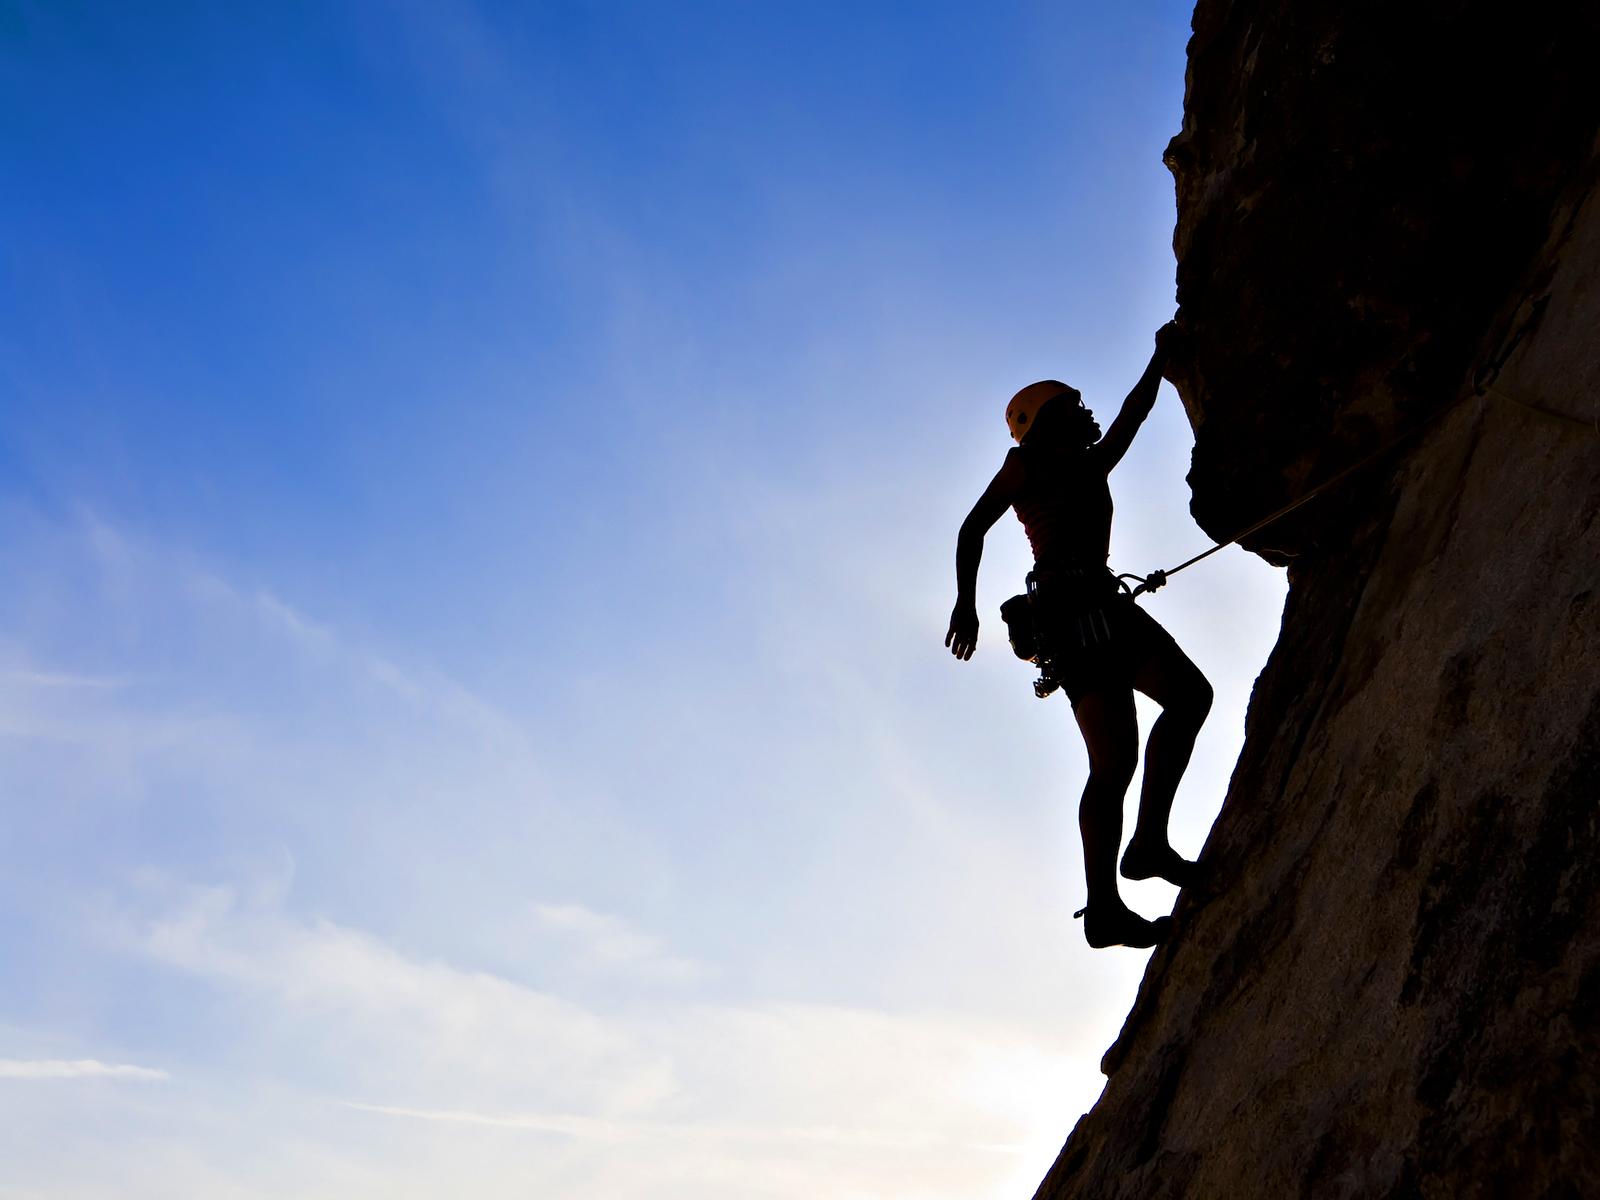 Rock Climbing Desktop Image